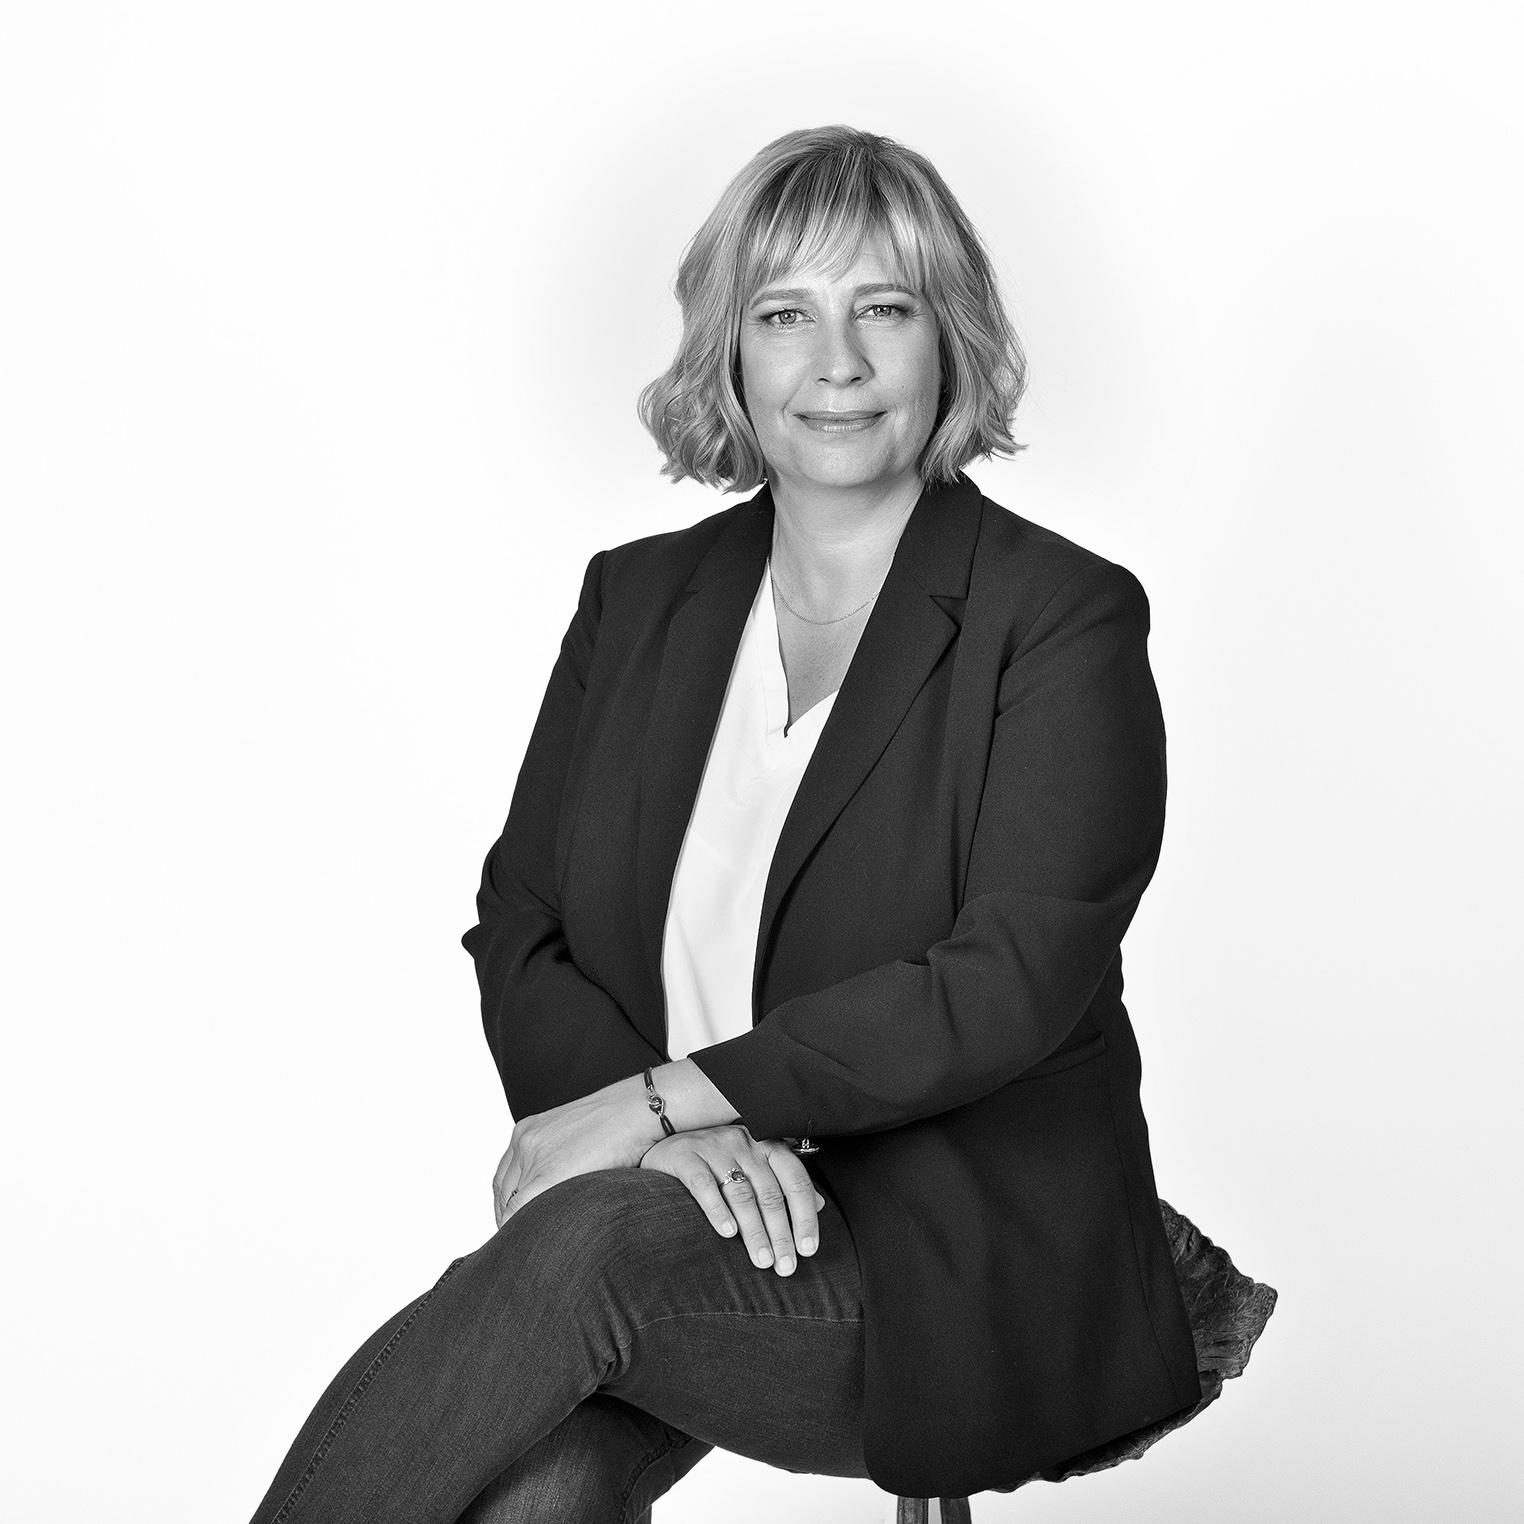 Hélène Feuillat